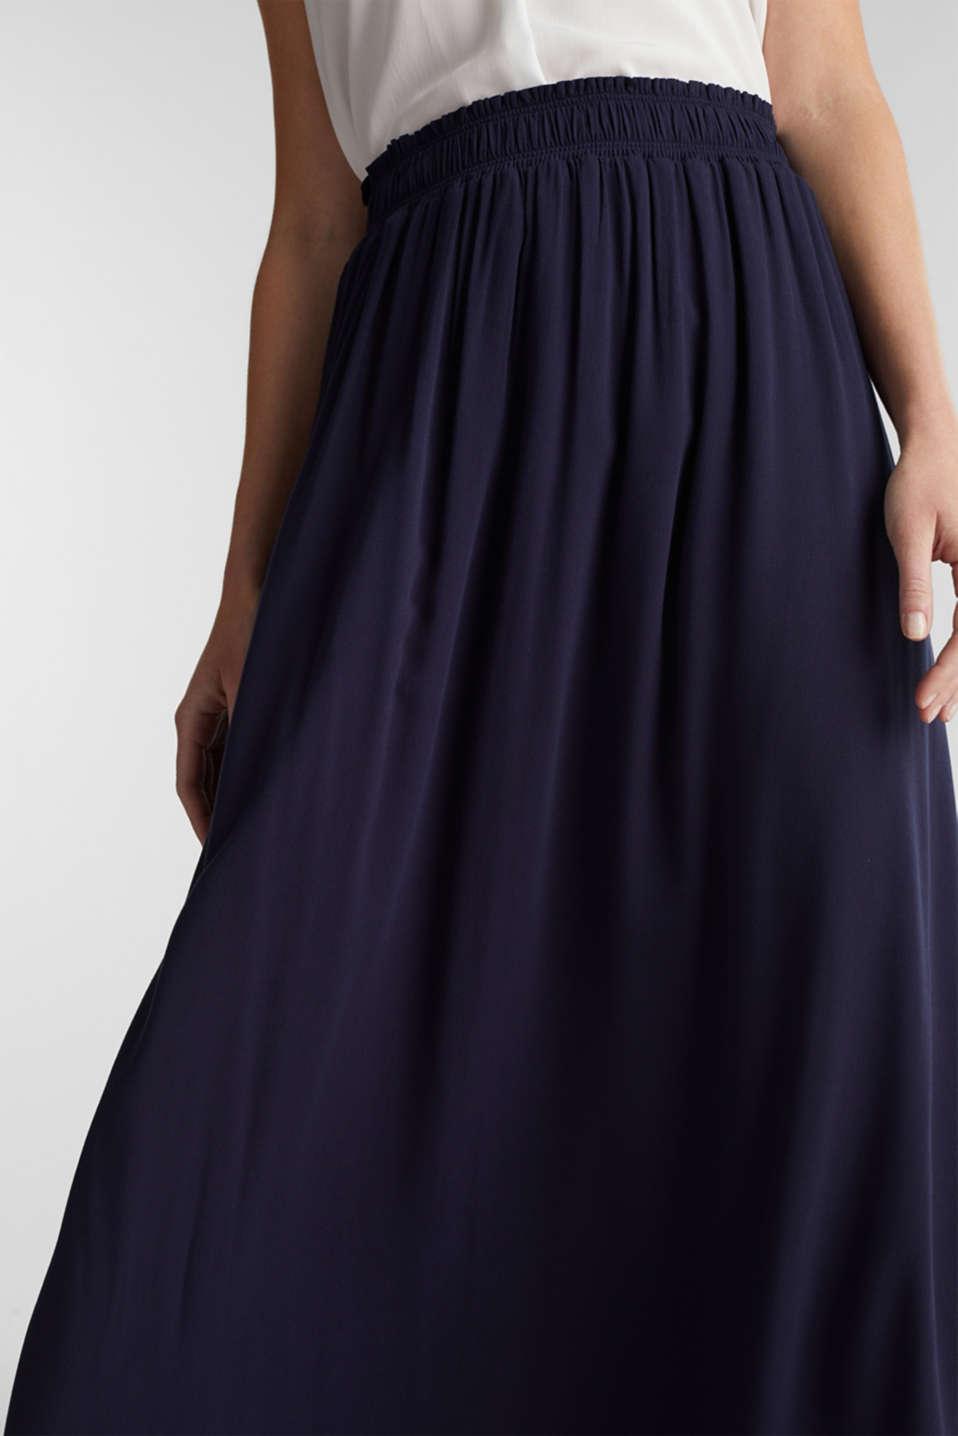 Maxi skirt in flowing crêpe, NAVY, detail image number 2